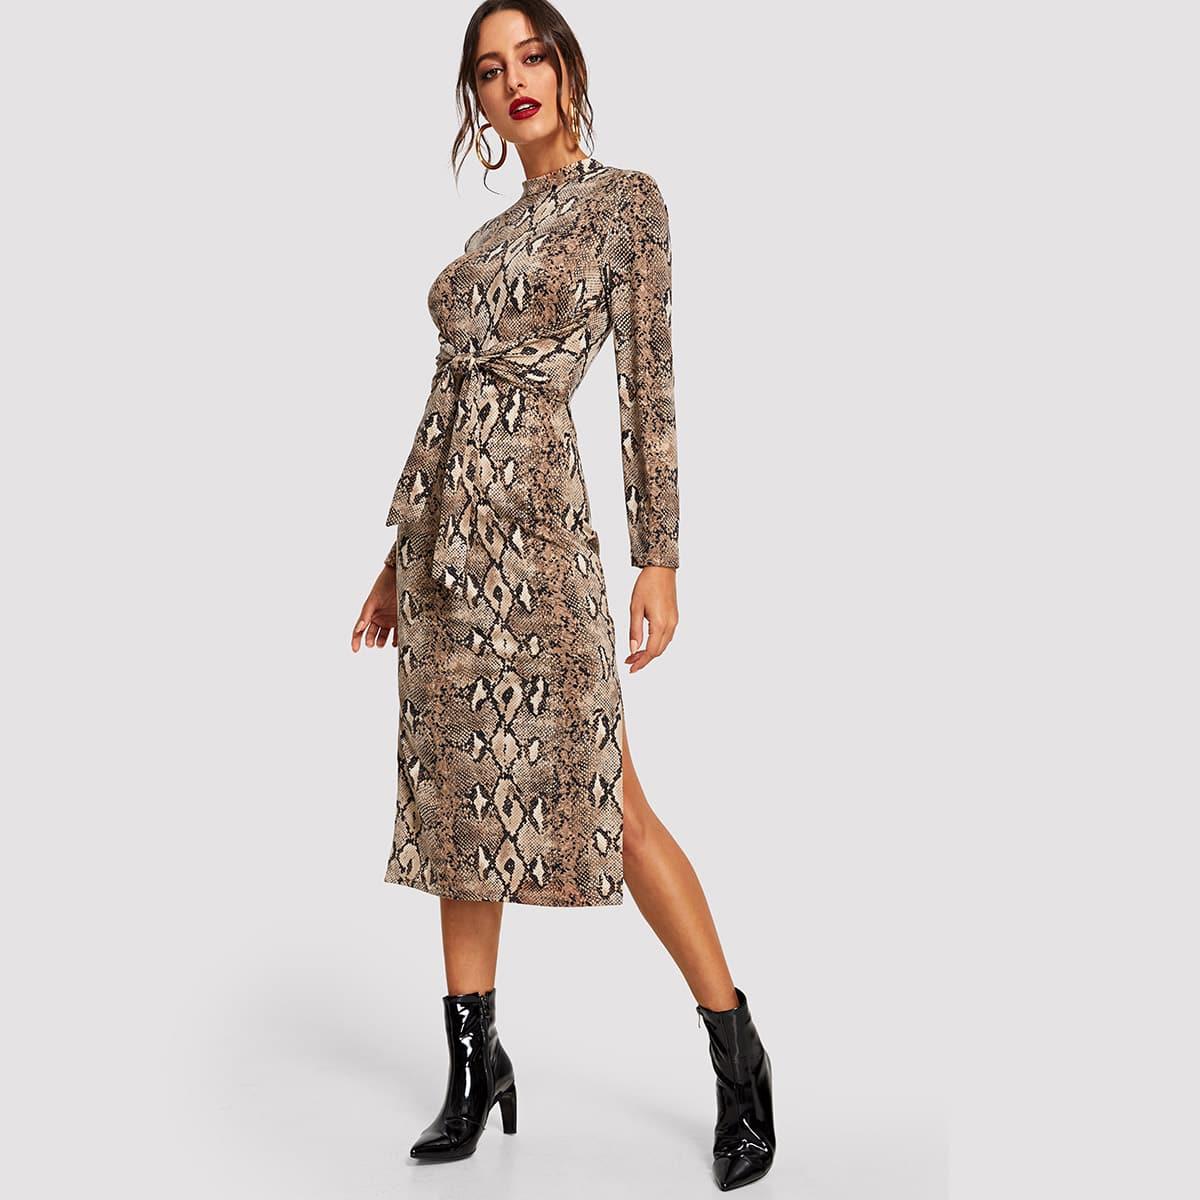 Slangenprint jurk met split en strikriem rond taille